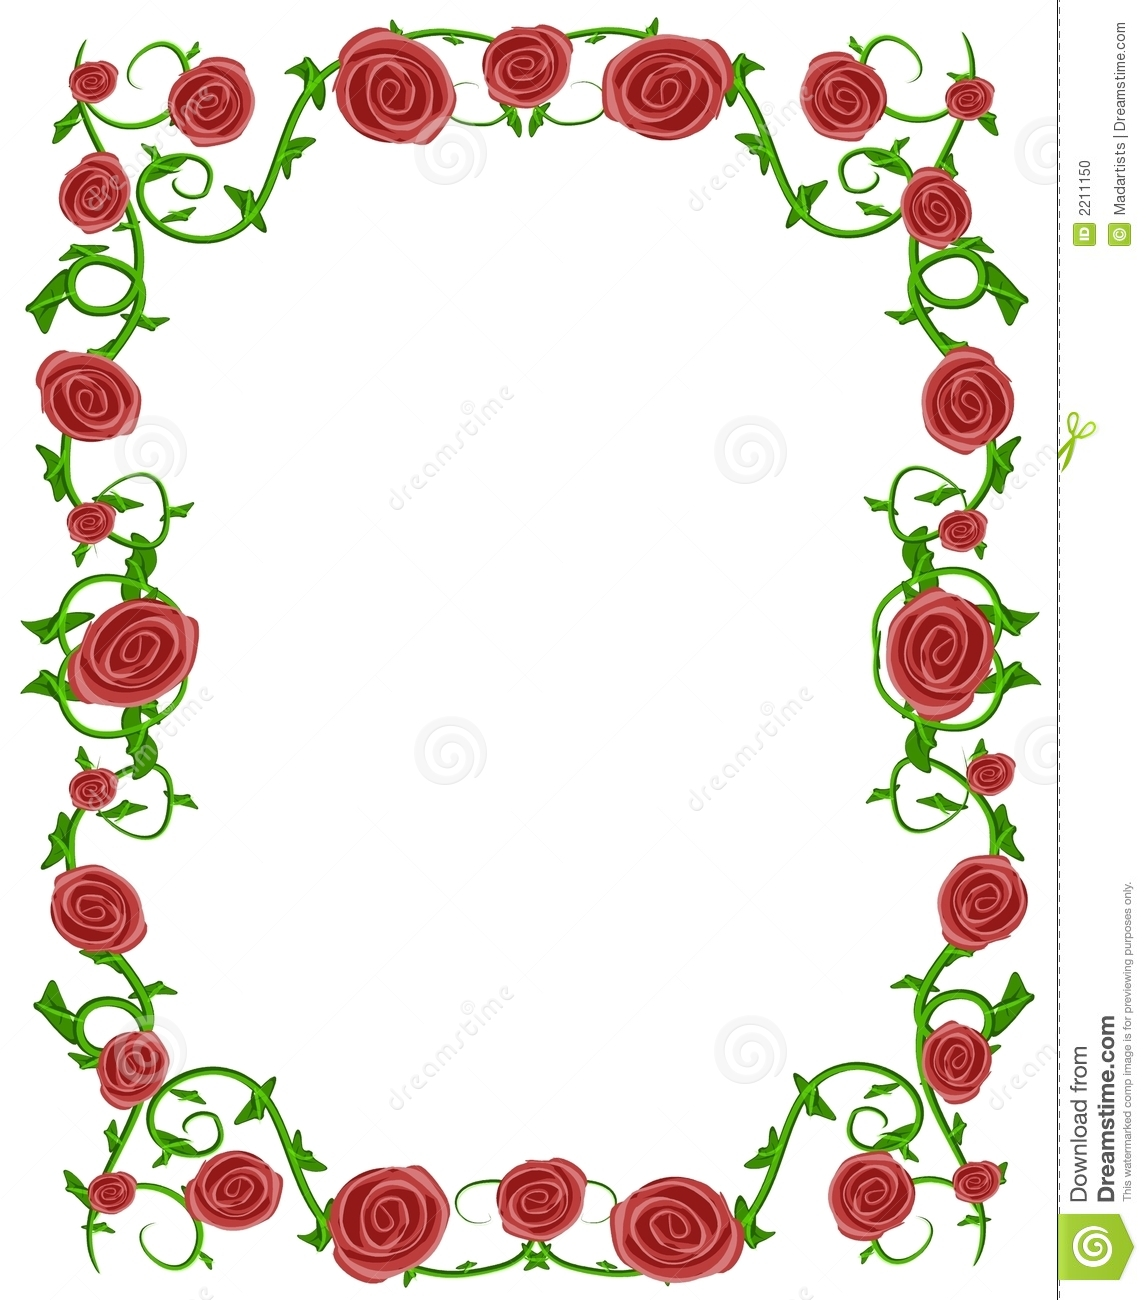 Pink Flower Border Clip Art | Clipart Panda - Free Clipart ...